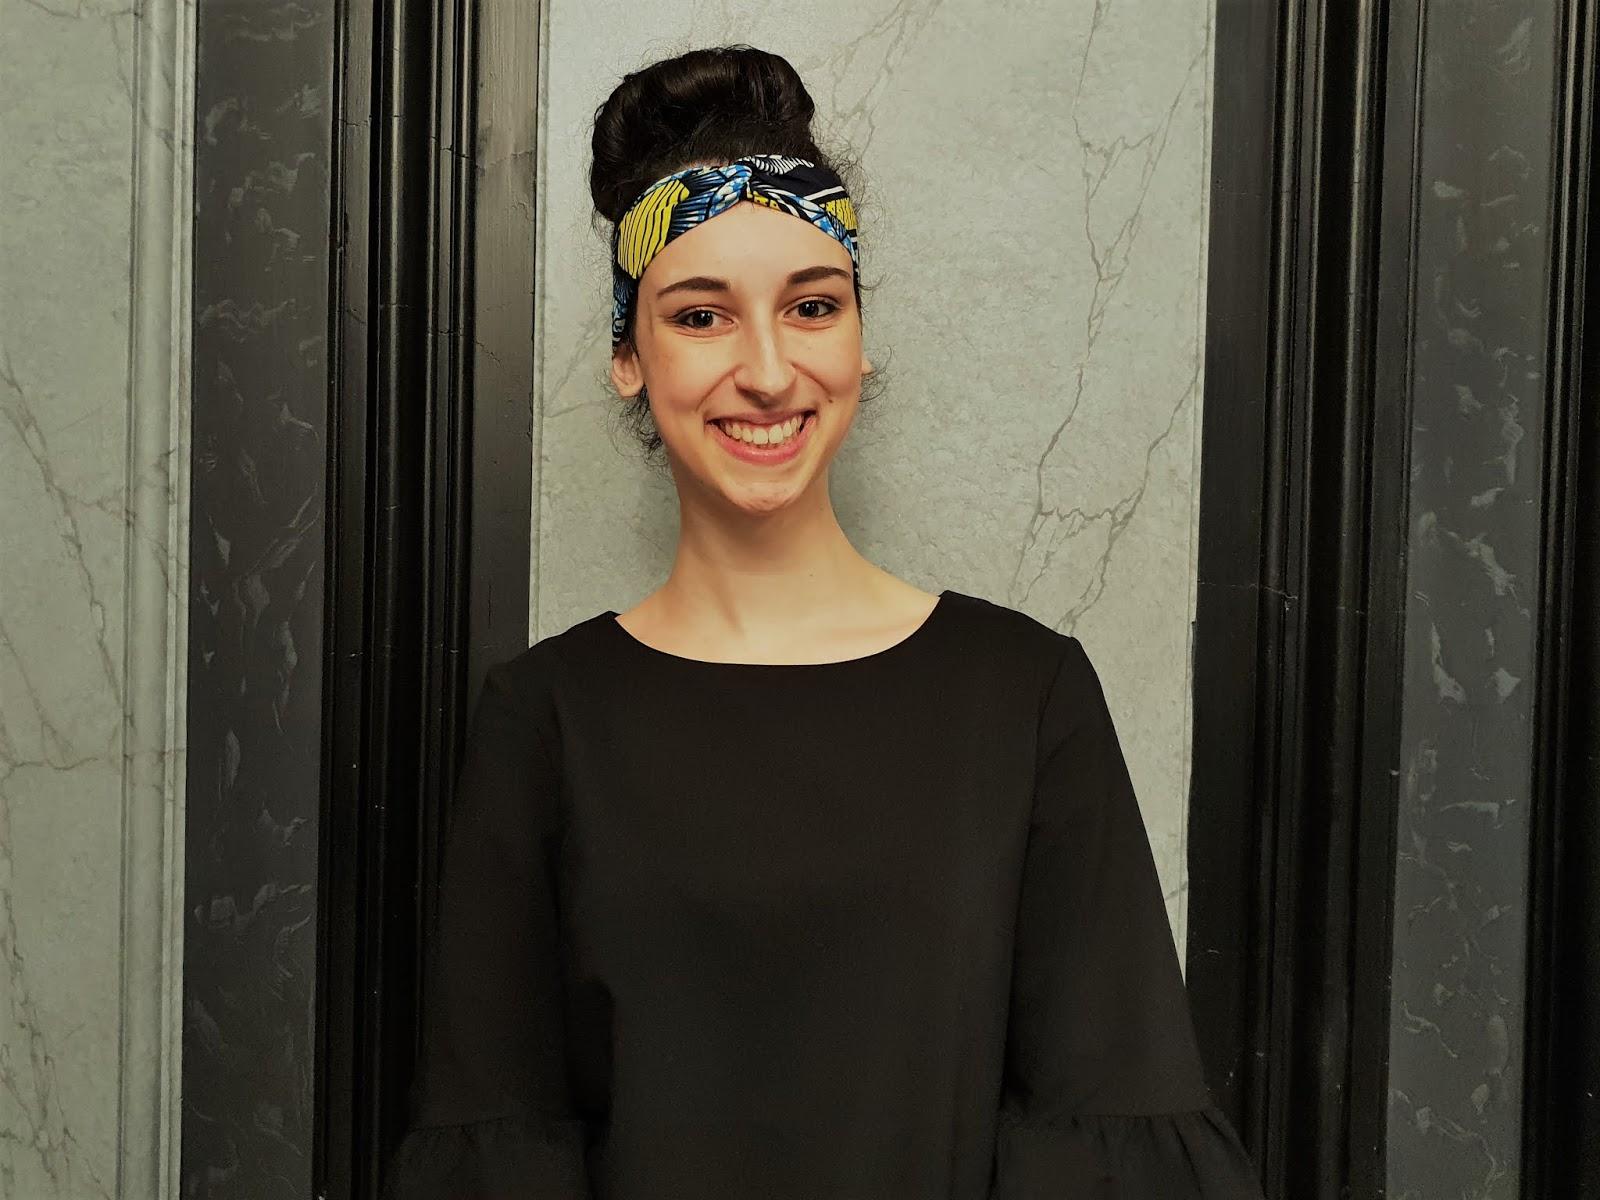 creatrice-accessoires-de-mode-couture-for-everybodie-manonleclercq-portrait-danslaruedacote.fr